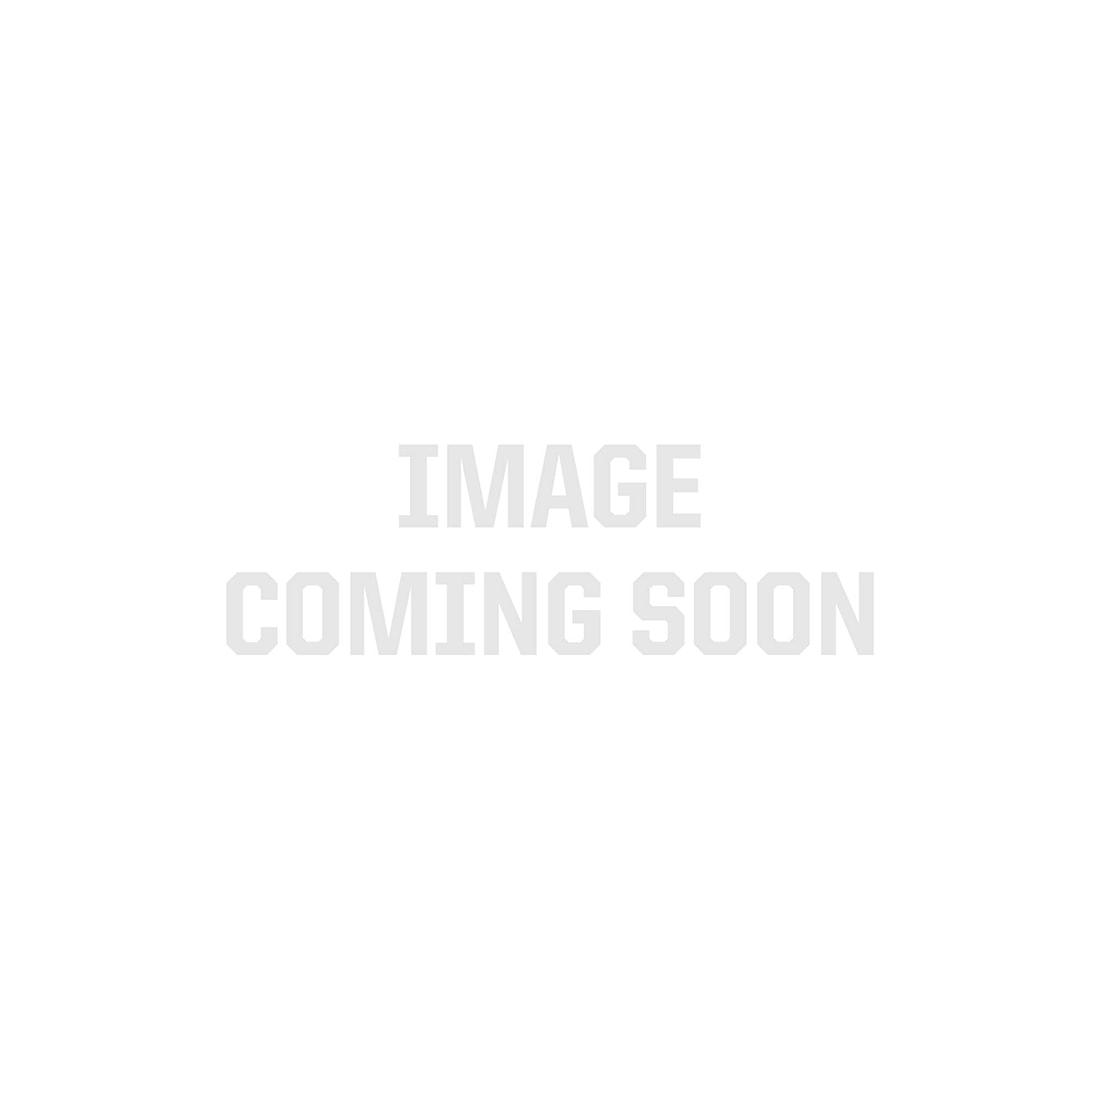 HyperFlex 2835 LED Strip Light - 2,400K - 60/m - CurrentControl - Sample Kit